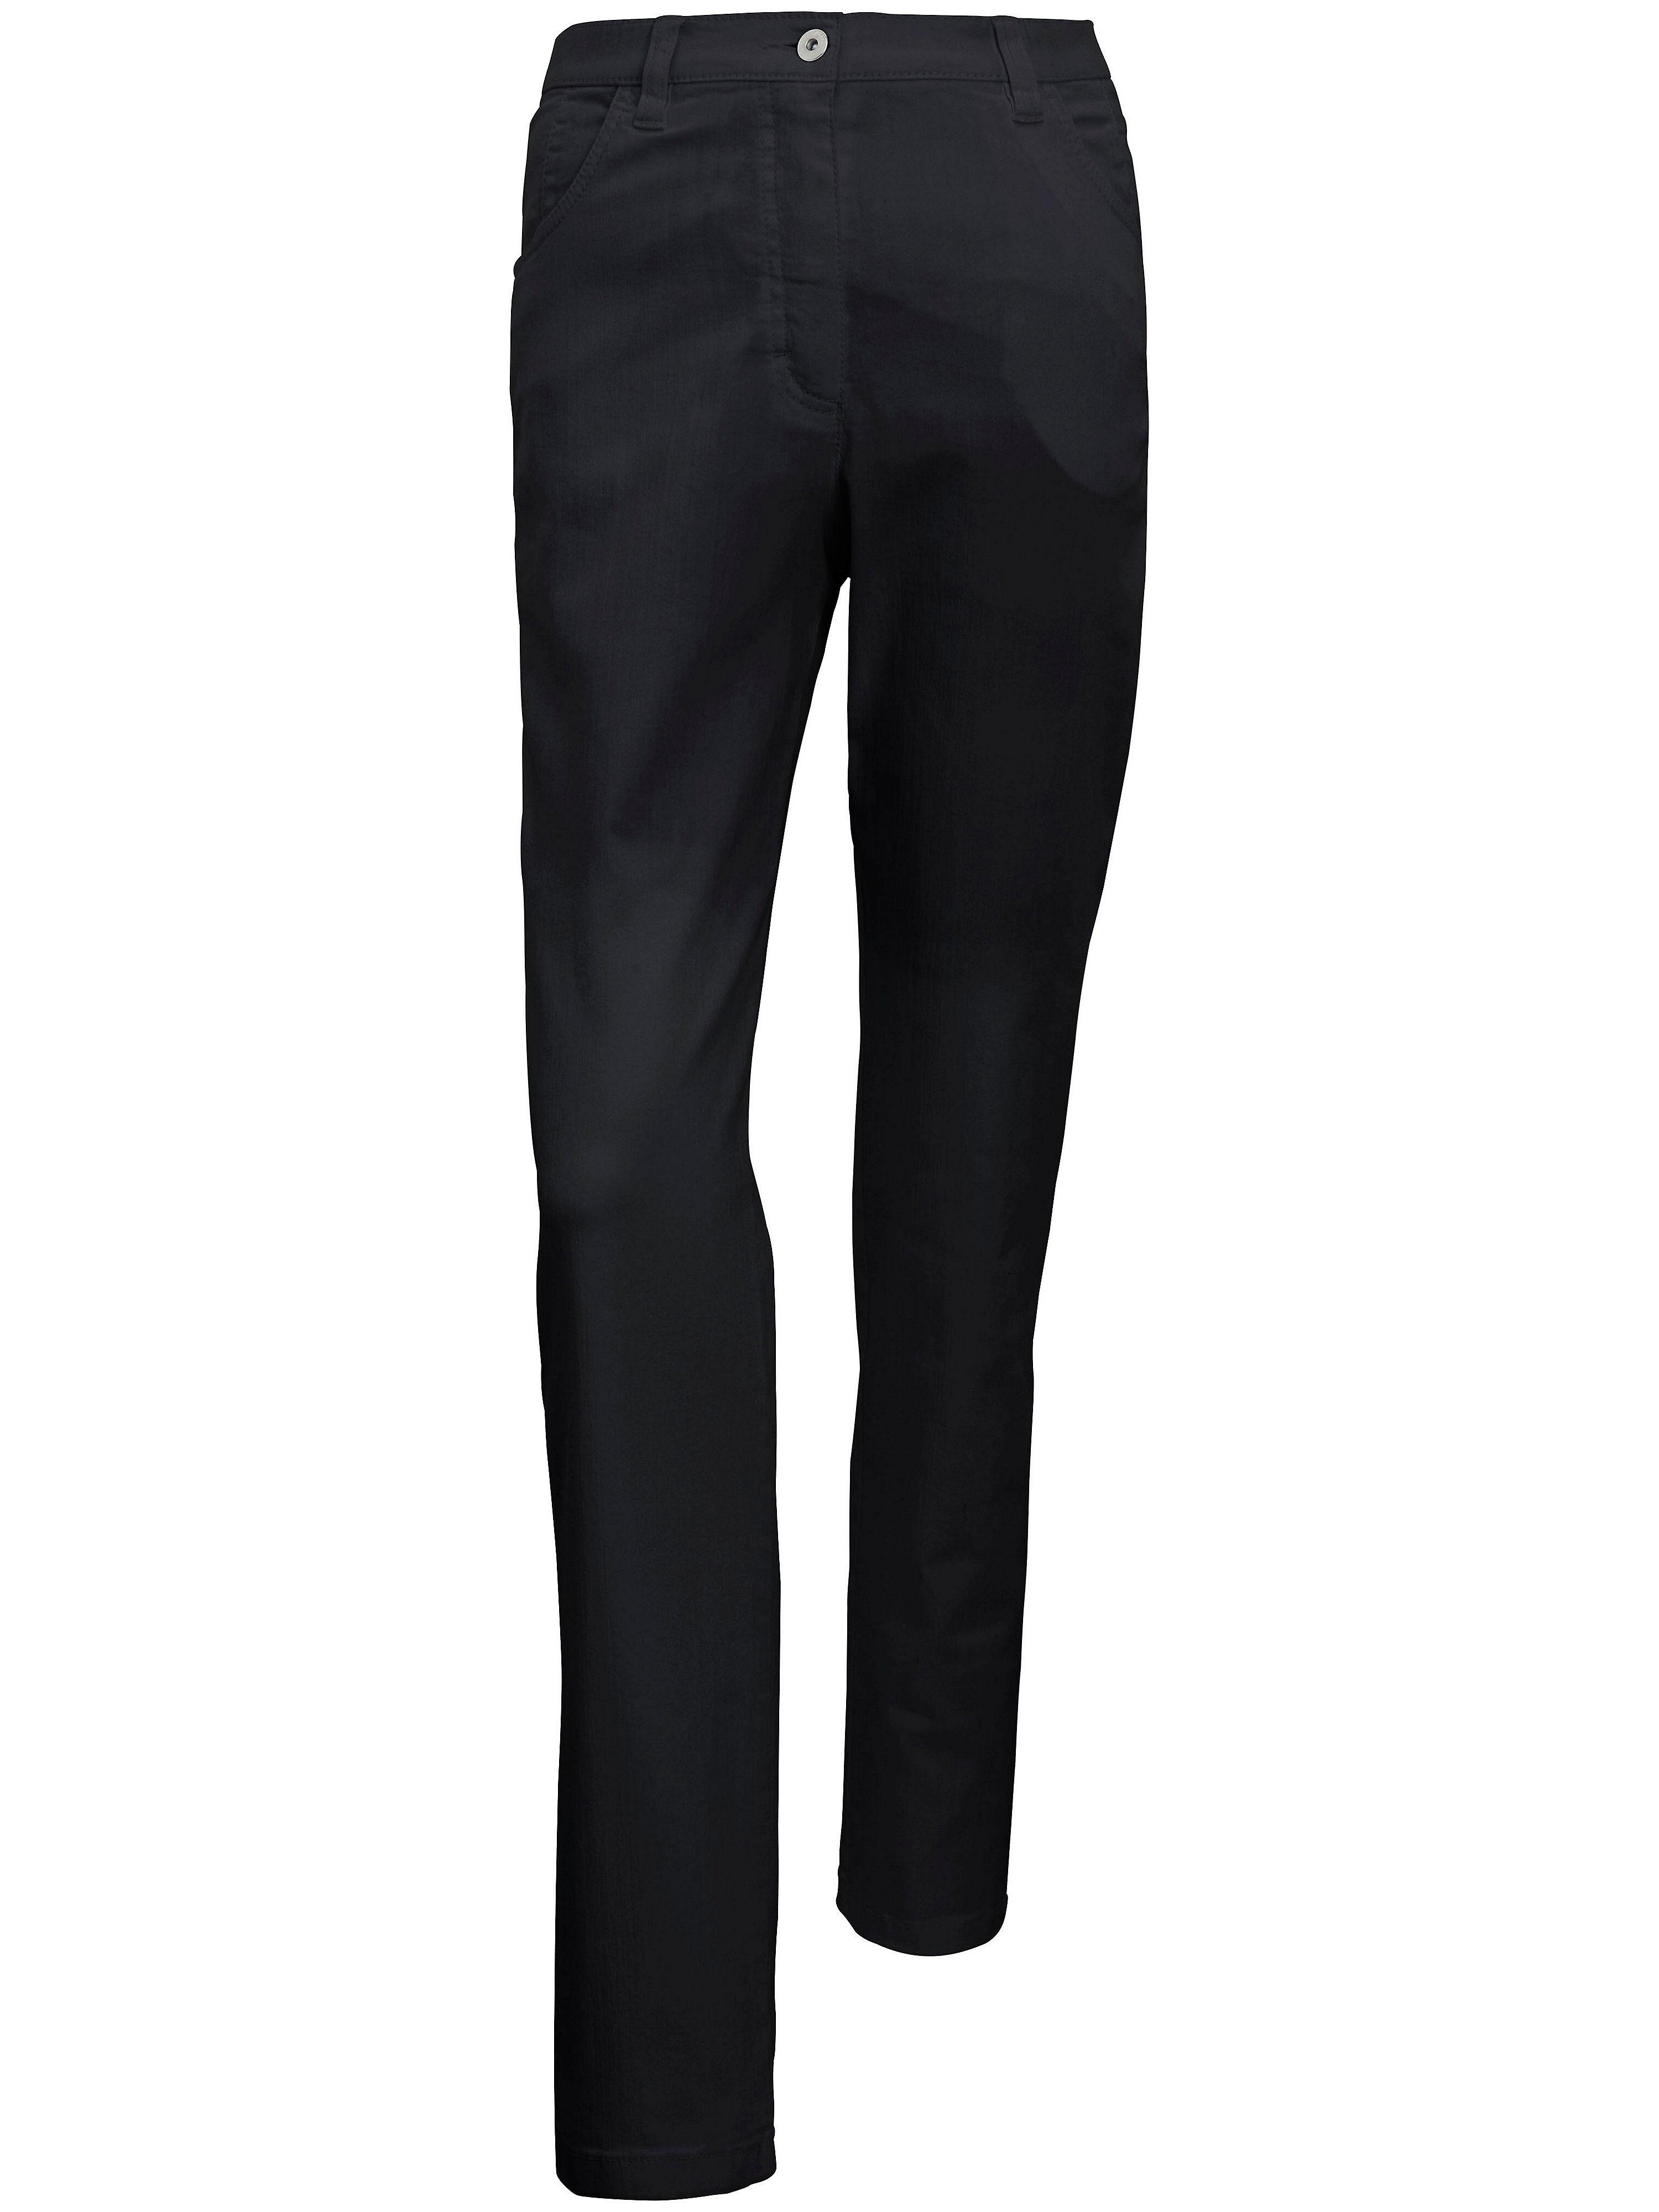 Jeans – Modell BETTY SLIM LEG KjBrand schwarz Größe: 20